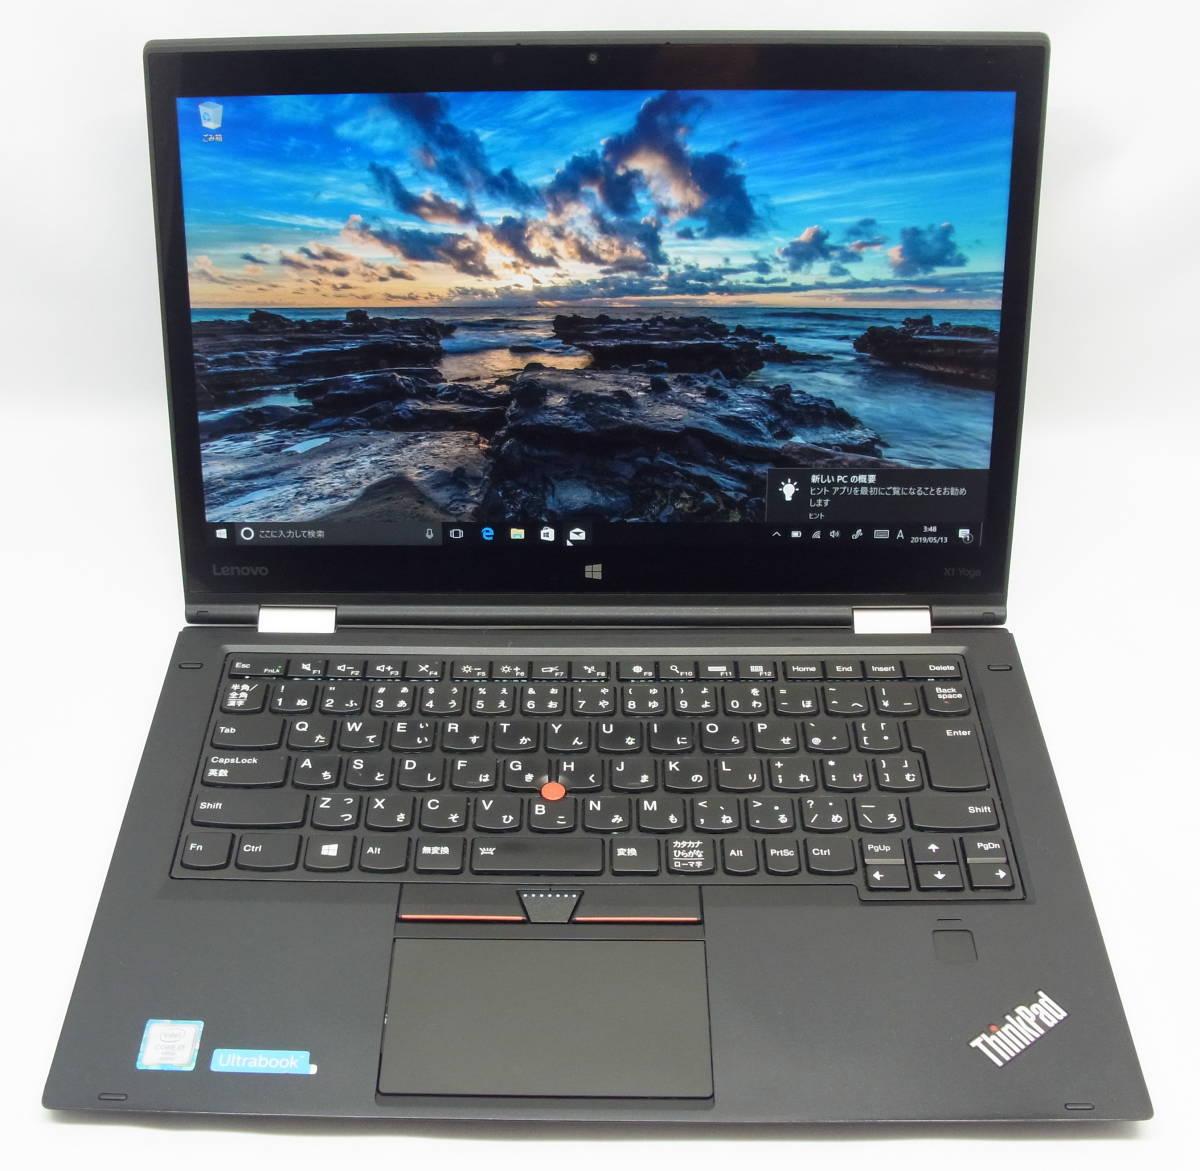 ThinkPad X1 Yoga・第6世代・Core i7-6600U・WQHD ・新品SSD大容量 1TB・ メモリ容量16GB・Win 10 Pro ・Office 2016(未開封)_画像2